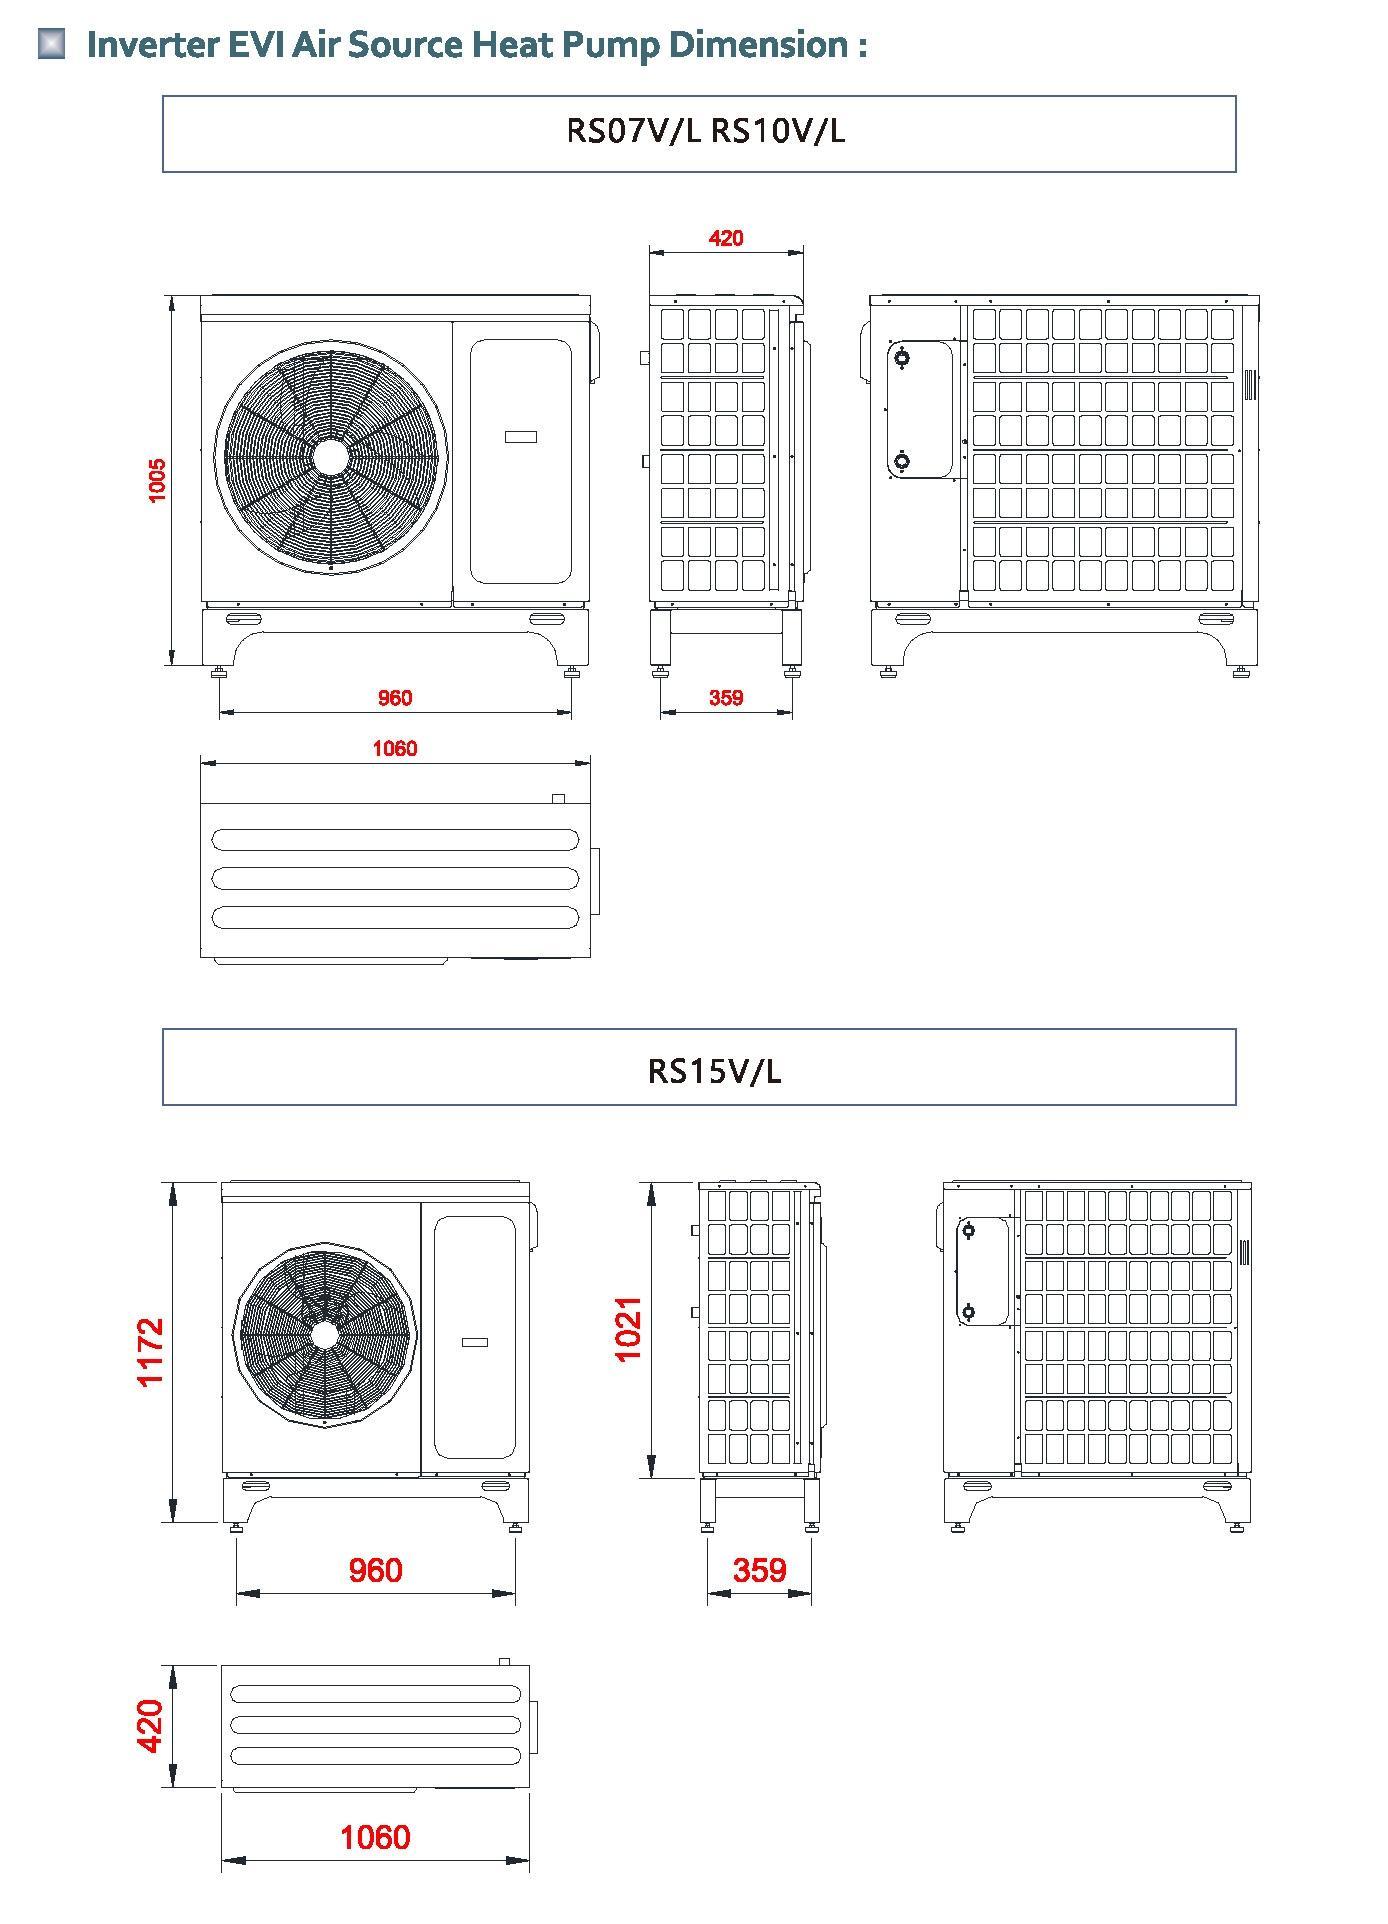 R32 EVI inverter heat pump RS15V/L 14